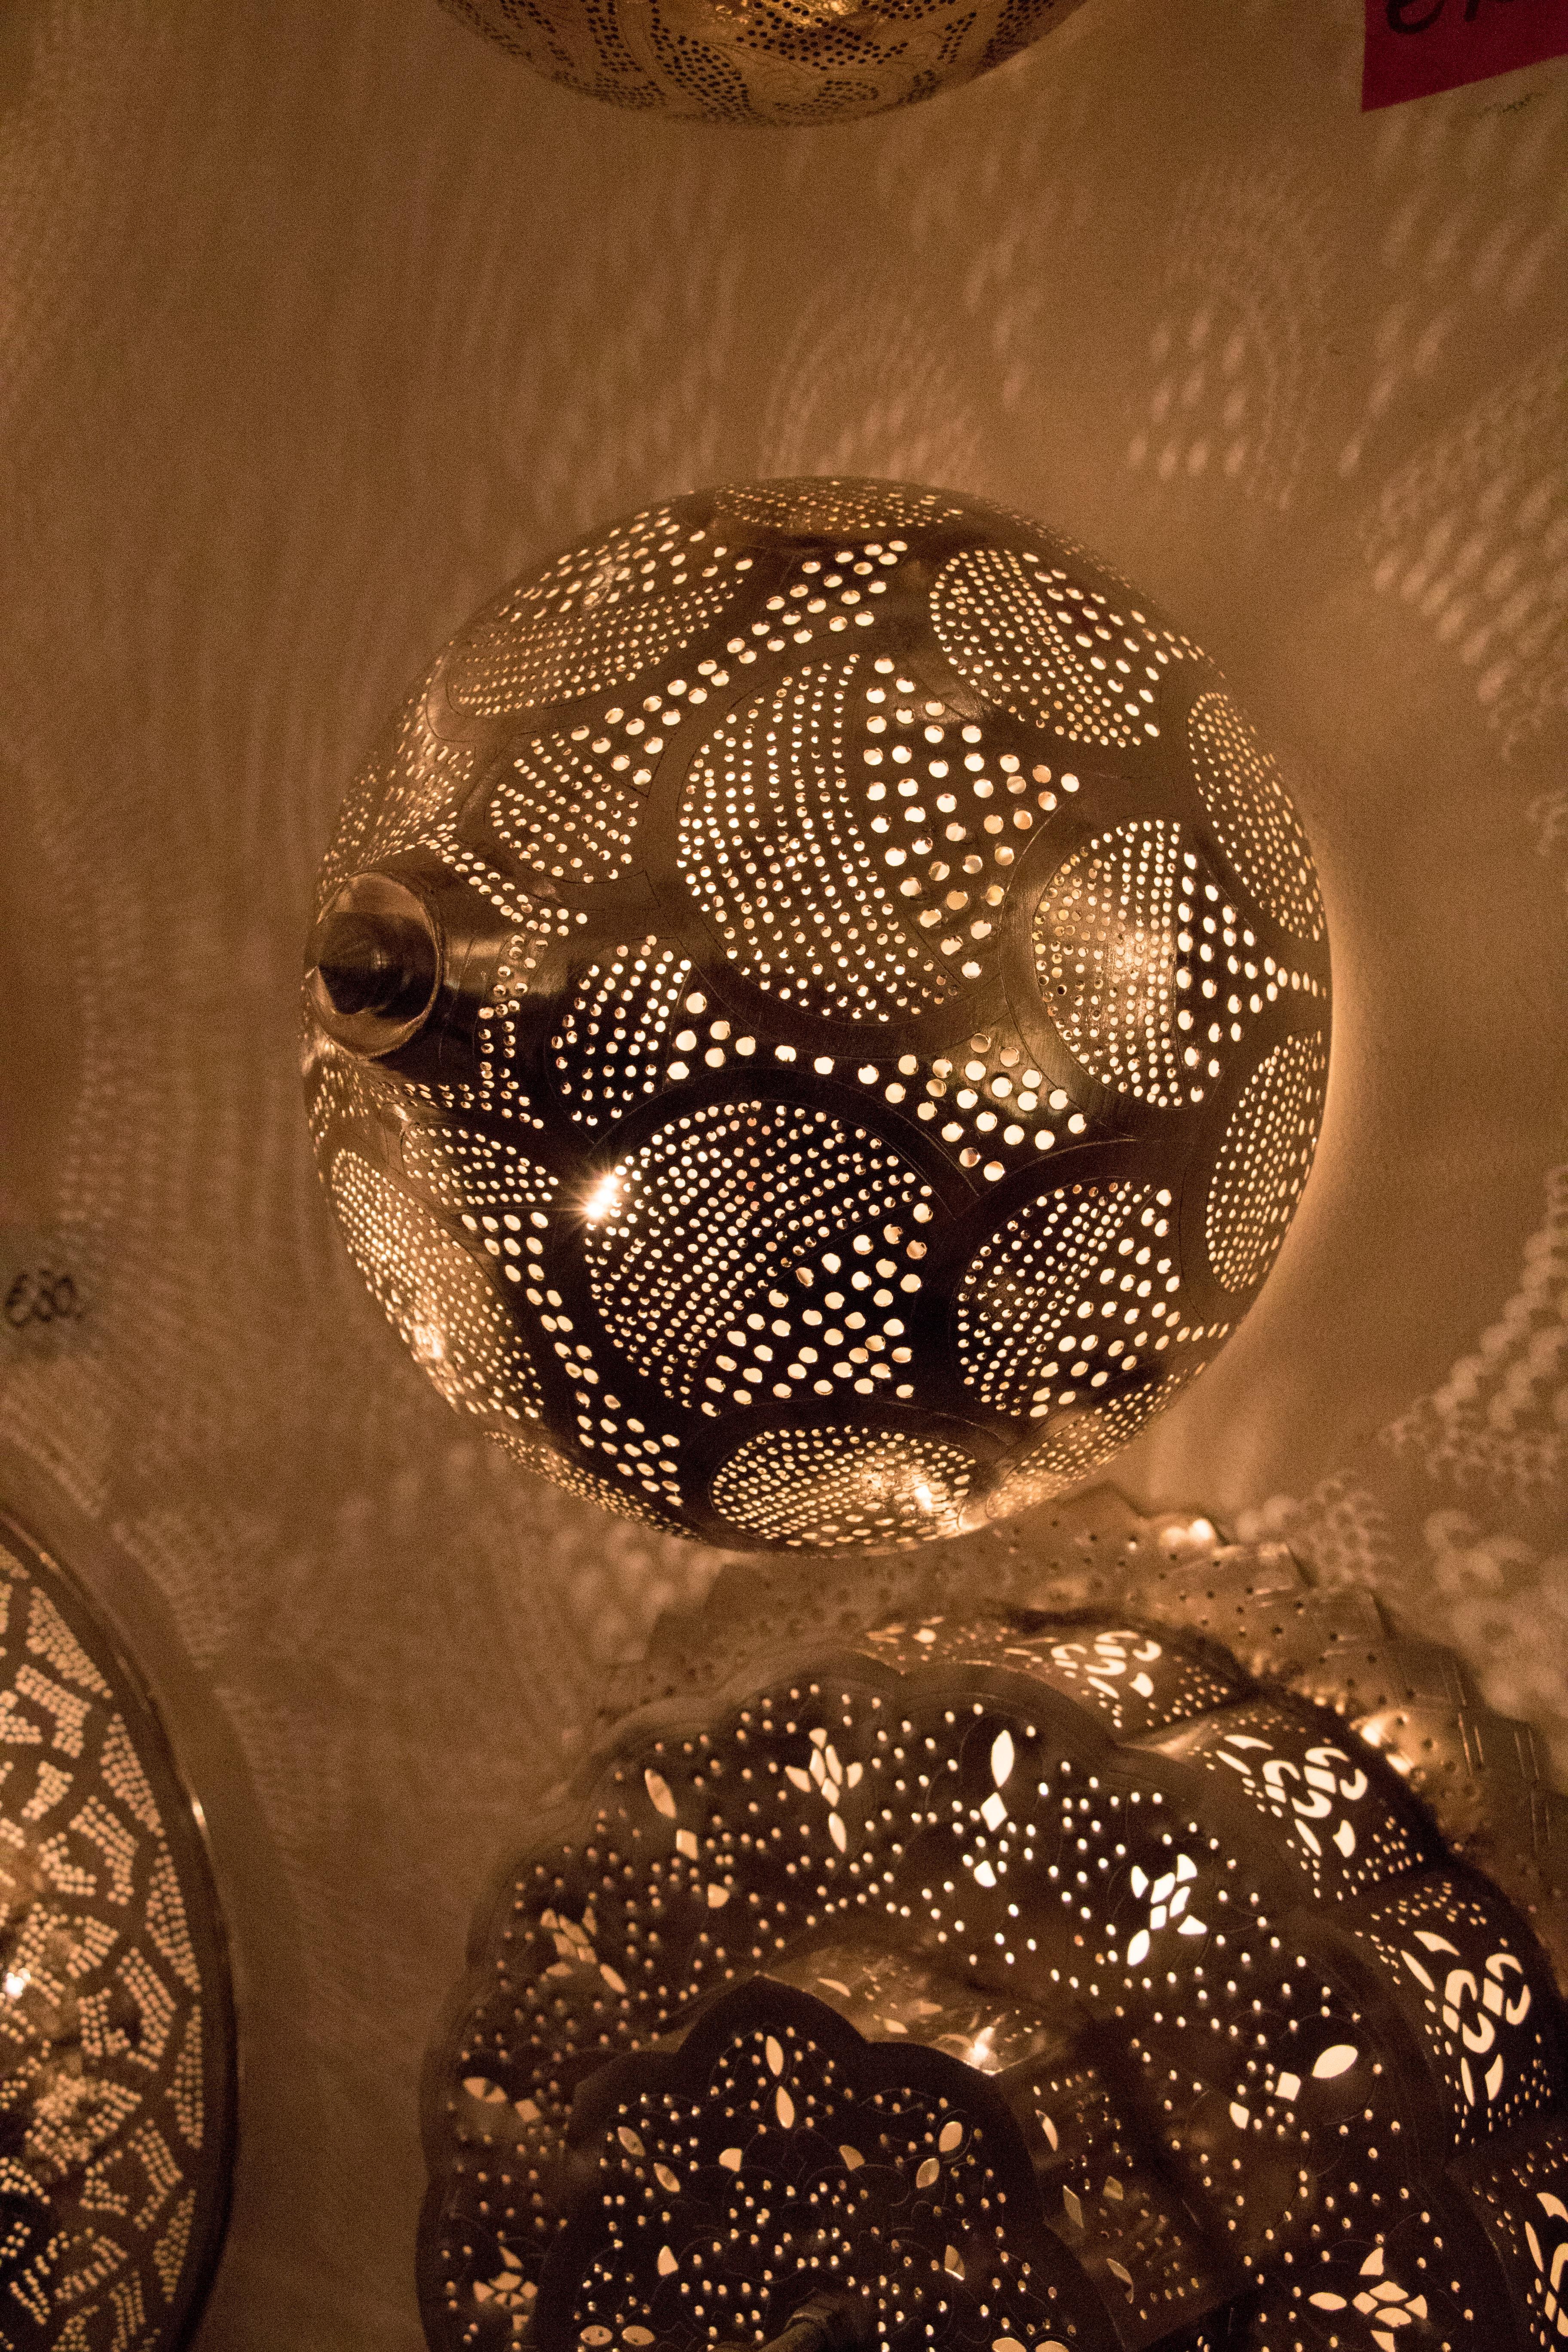 keukentegels groot : Filigrain Plafonni Re Groot Zilver Gomsa Webshop